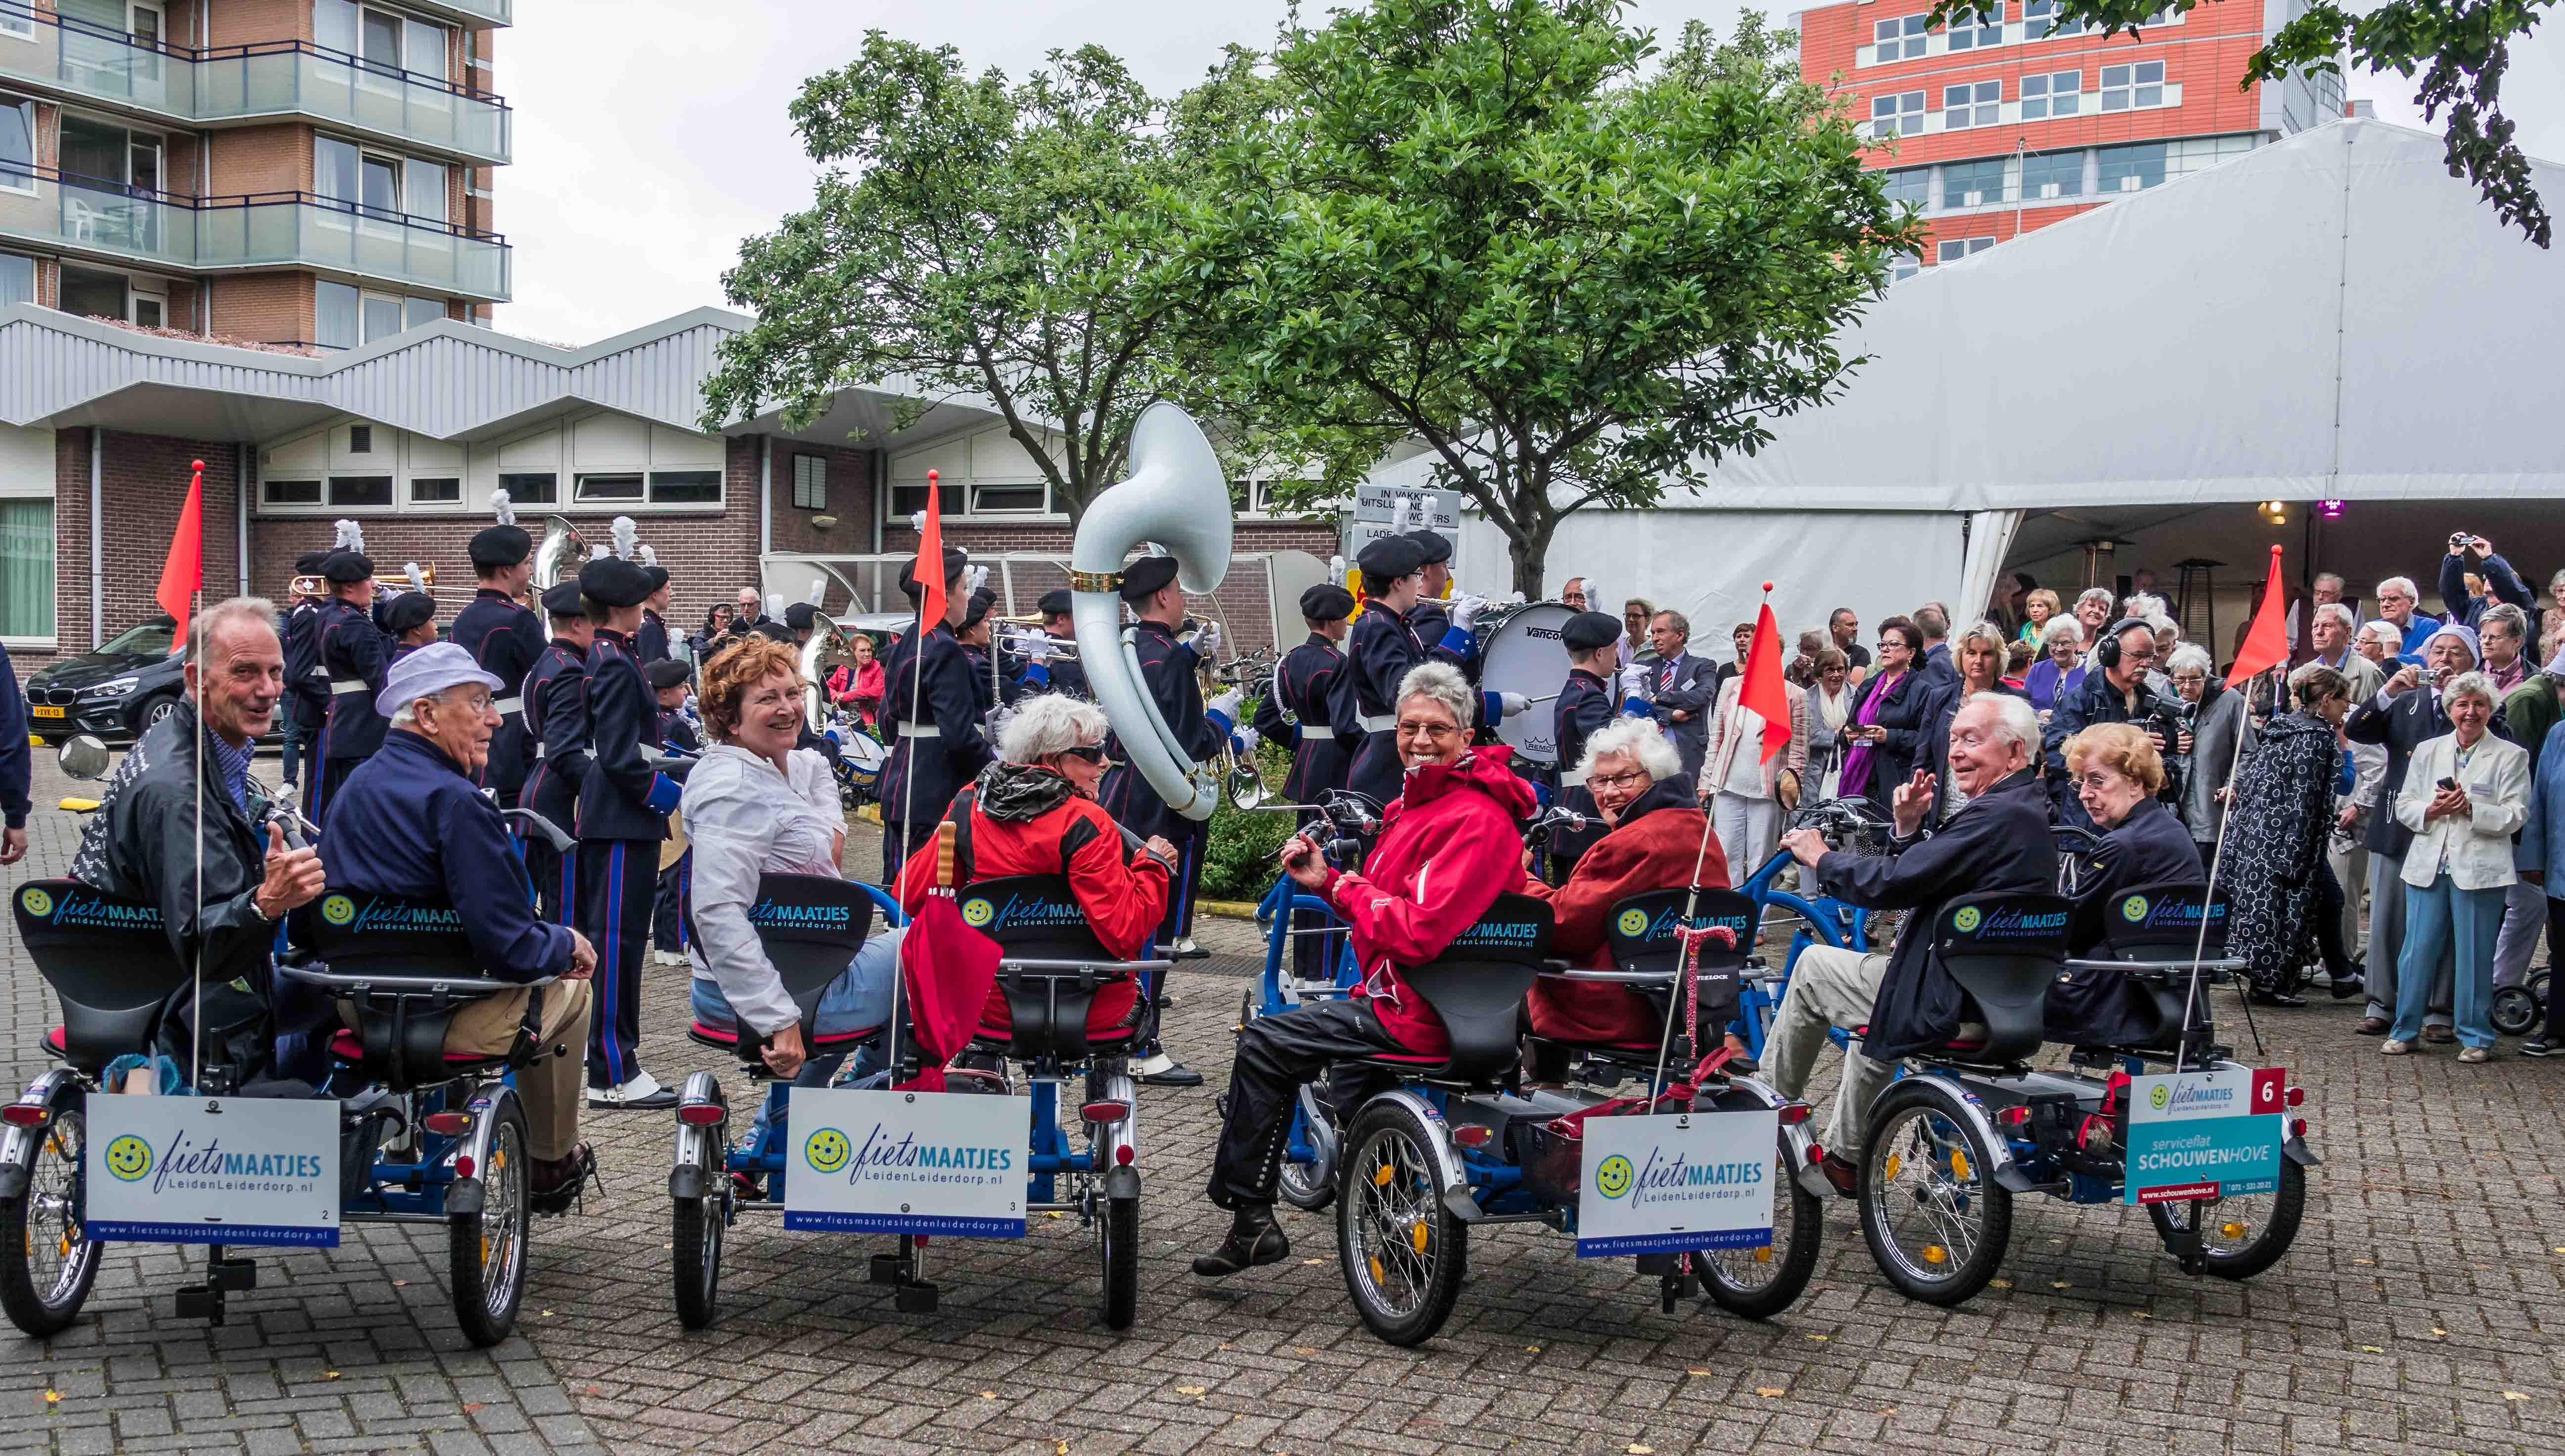 20170701-FM-Schouwenhove-6e-fiets-052-groep